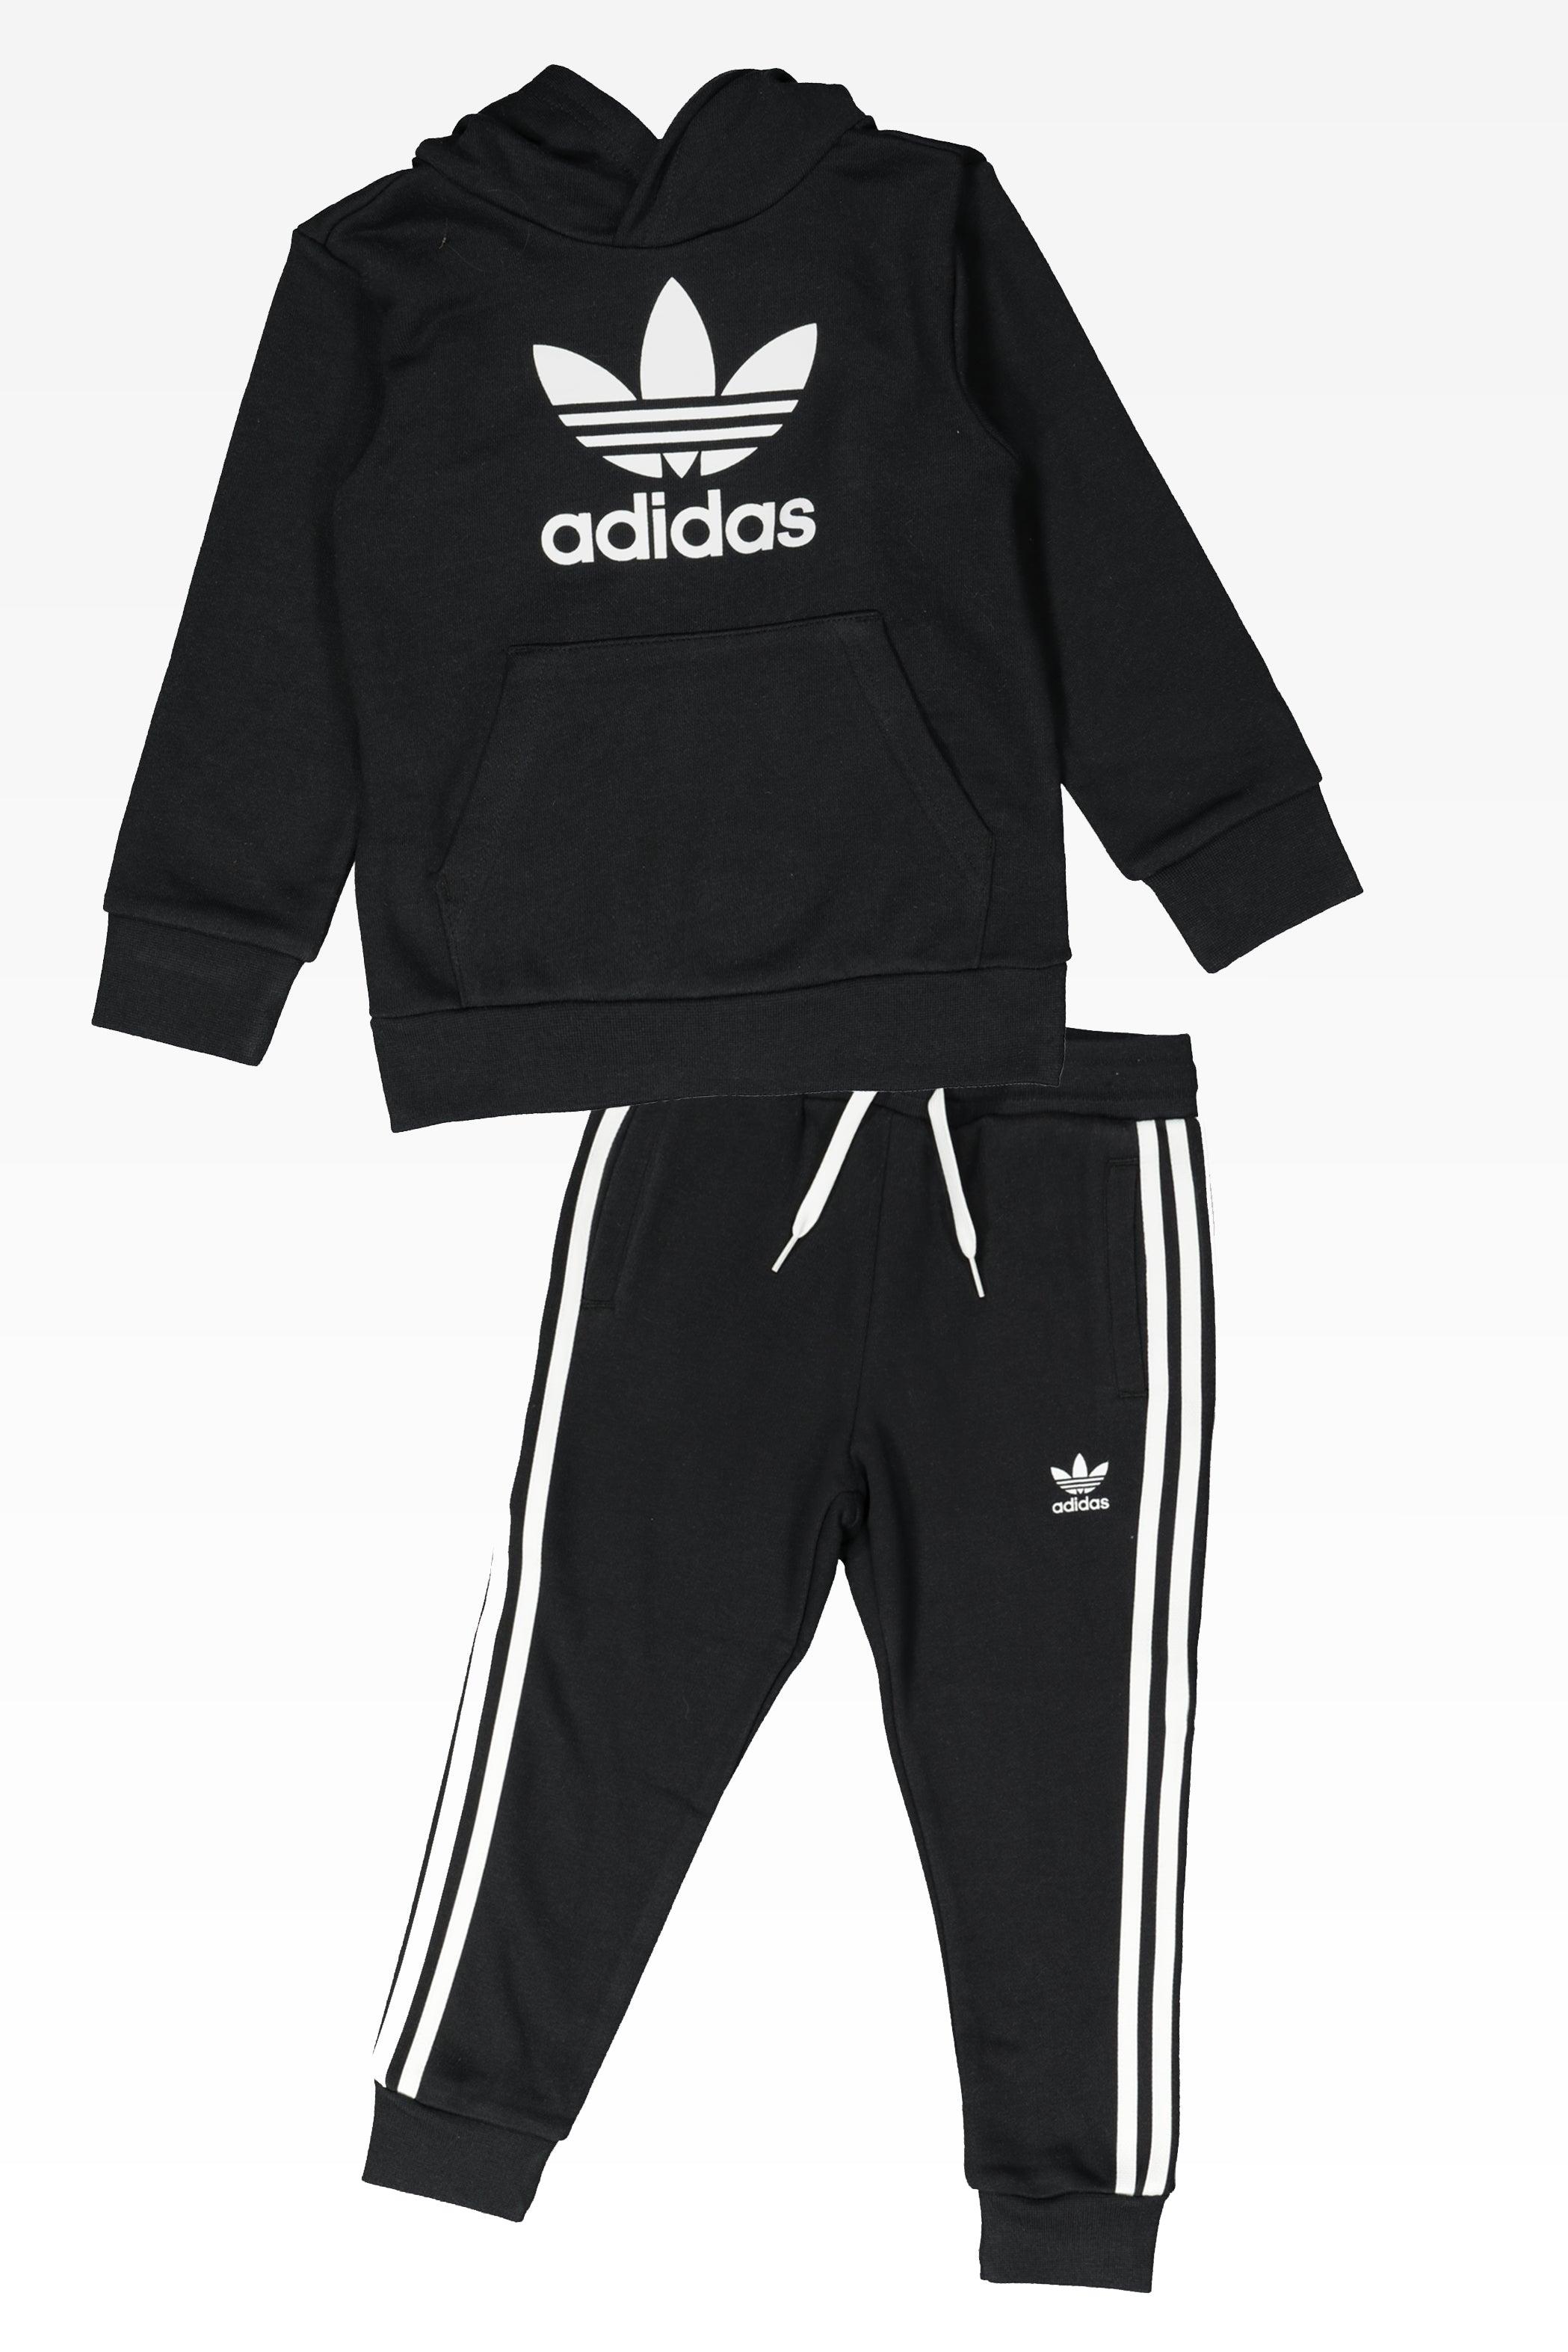 Adidas Kids Trefoil Hoodie Set BlackWhite